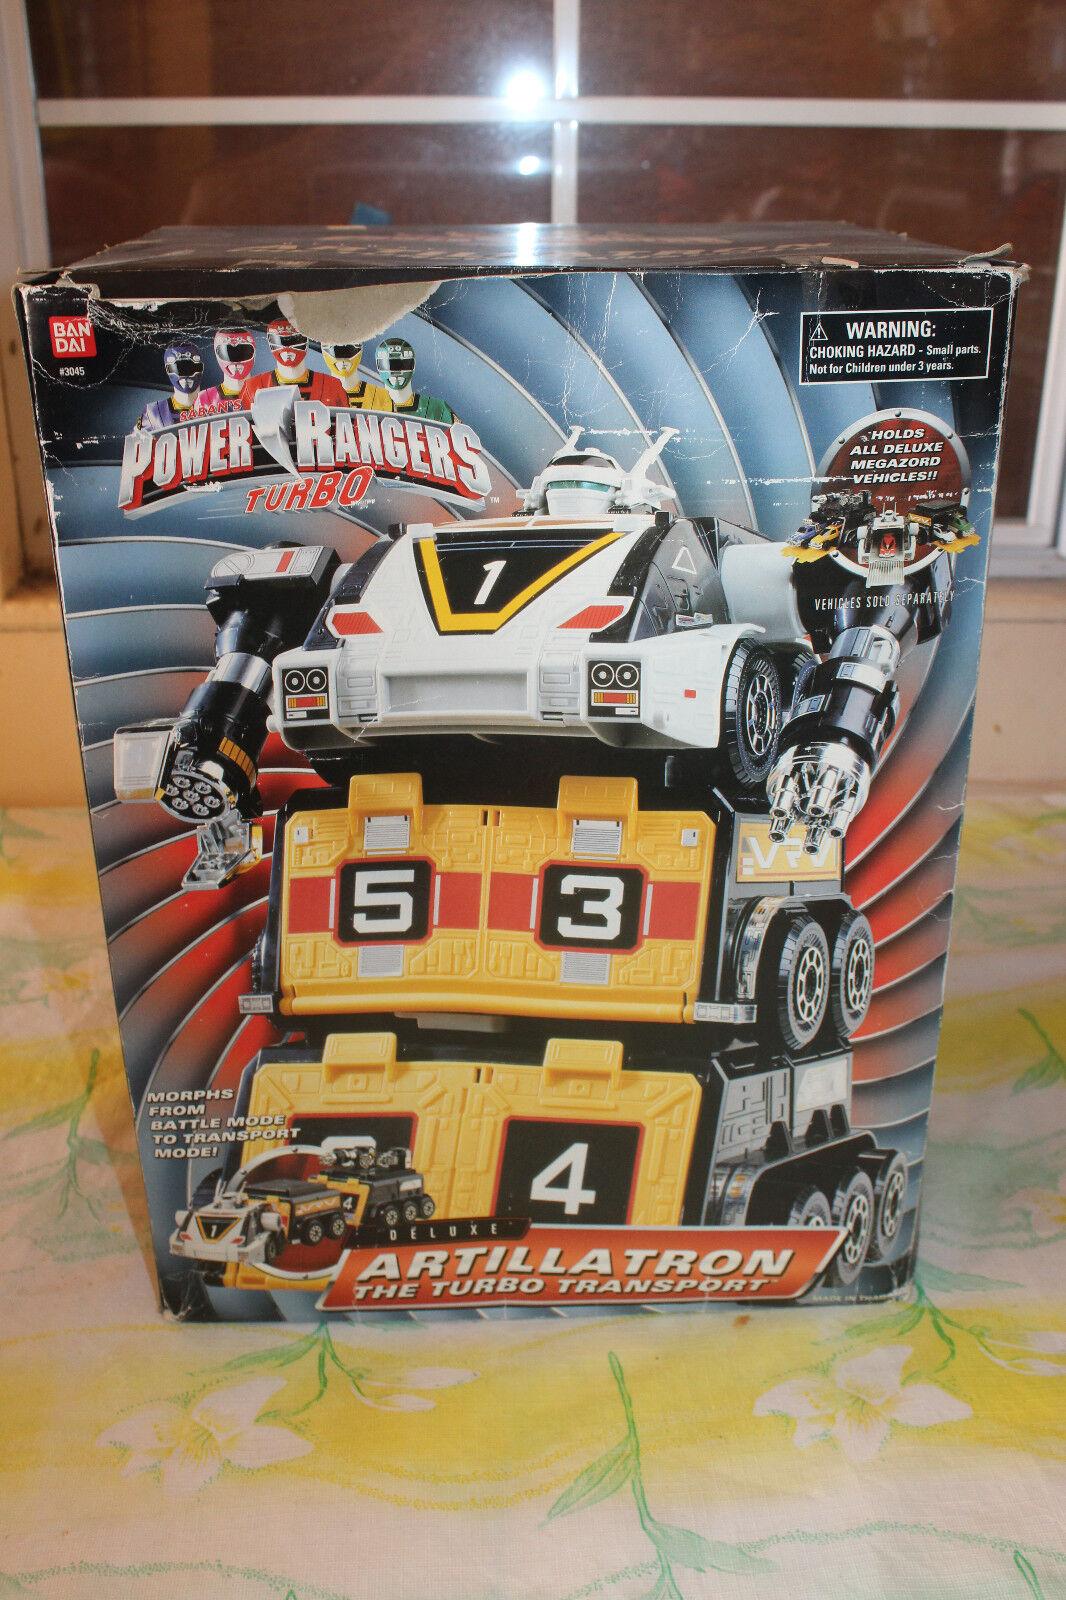 Bandai Power Rangers Turbo Artillatron The Turbo Transport w/ 5 Cars